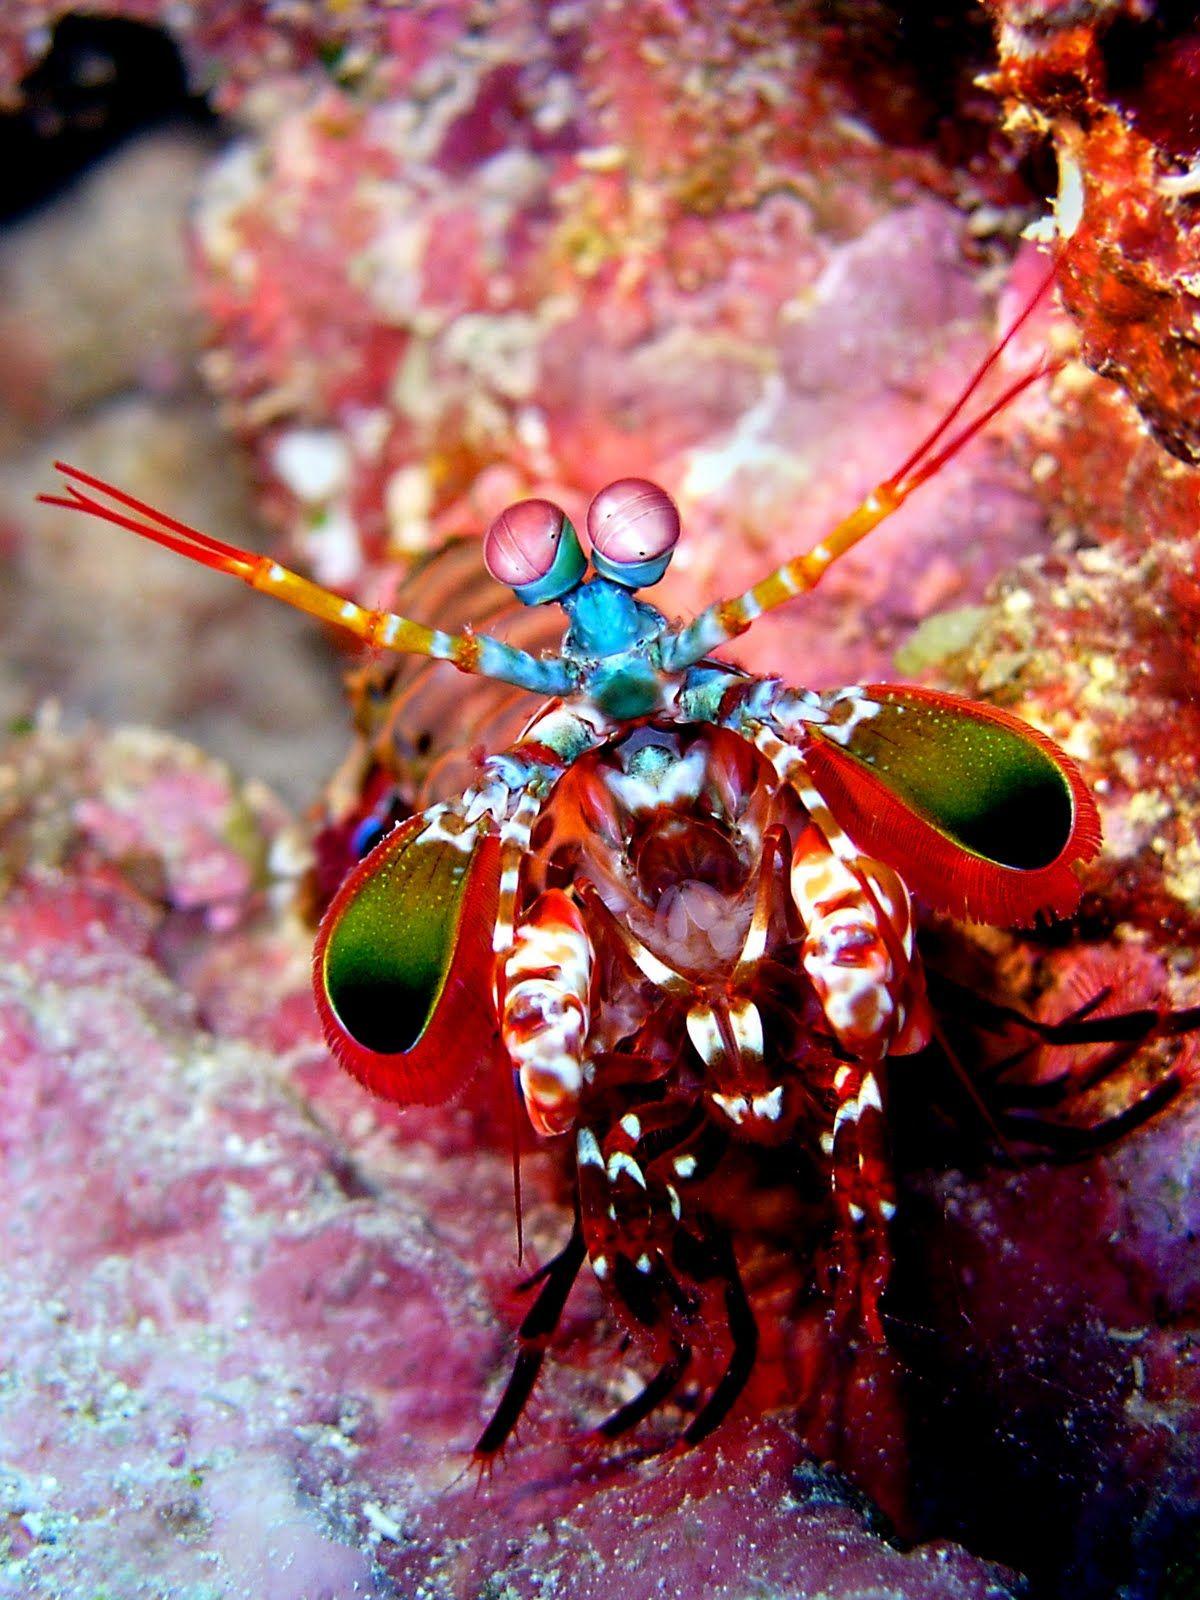 peacock shrimp, mantis shrimp | Under Water & In The Water ...